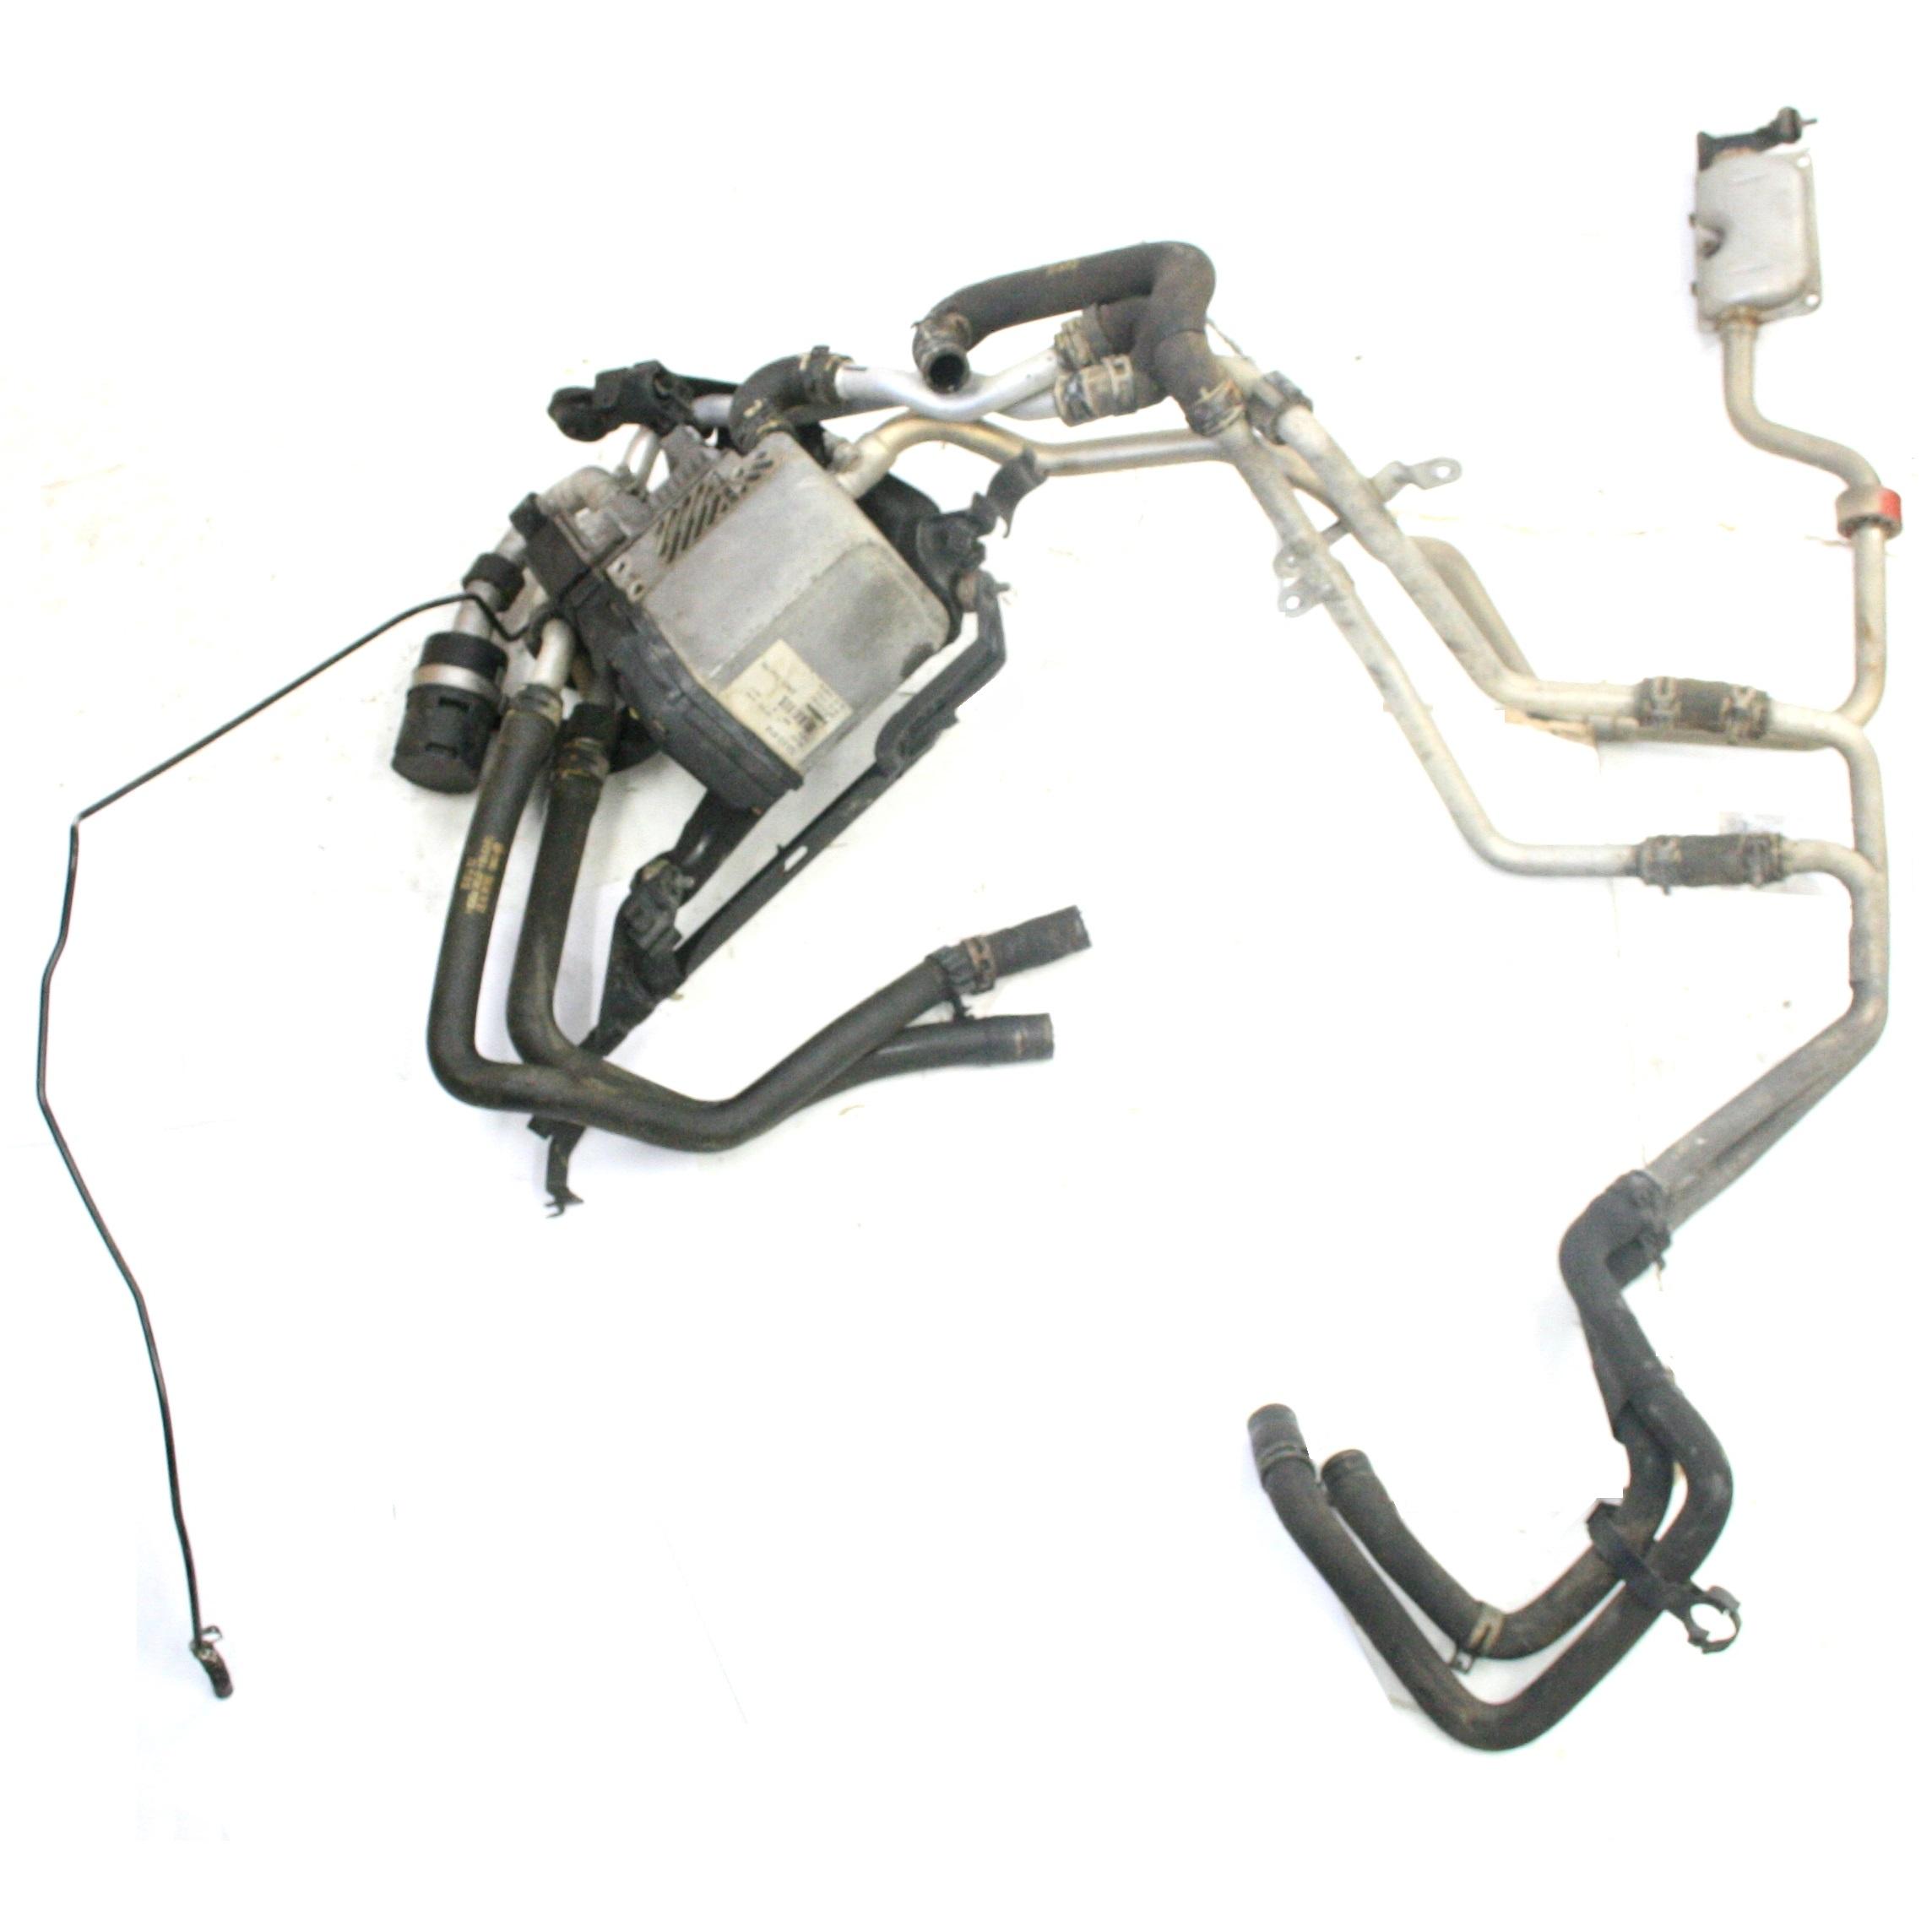 Used Genuine Vw Touareg Webasto Rear Auxillary Heater 7l6 815 071 A Uk S No 1 Specialist Vw